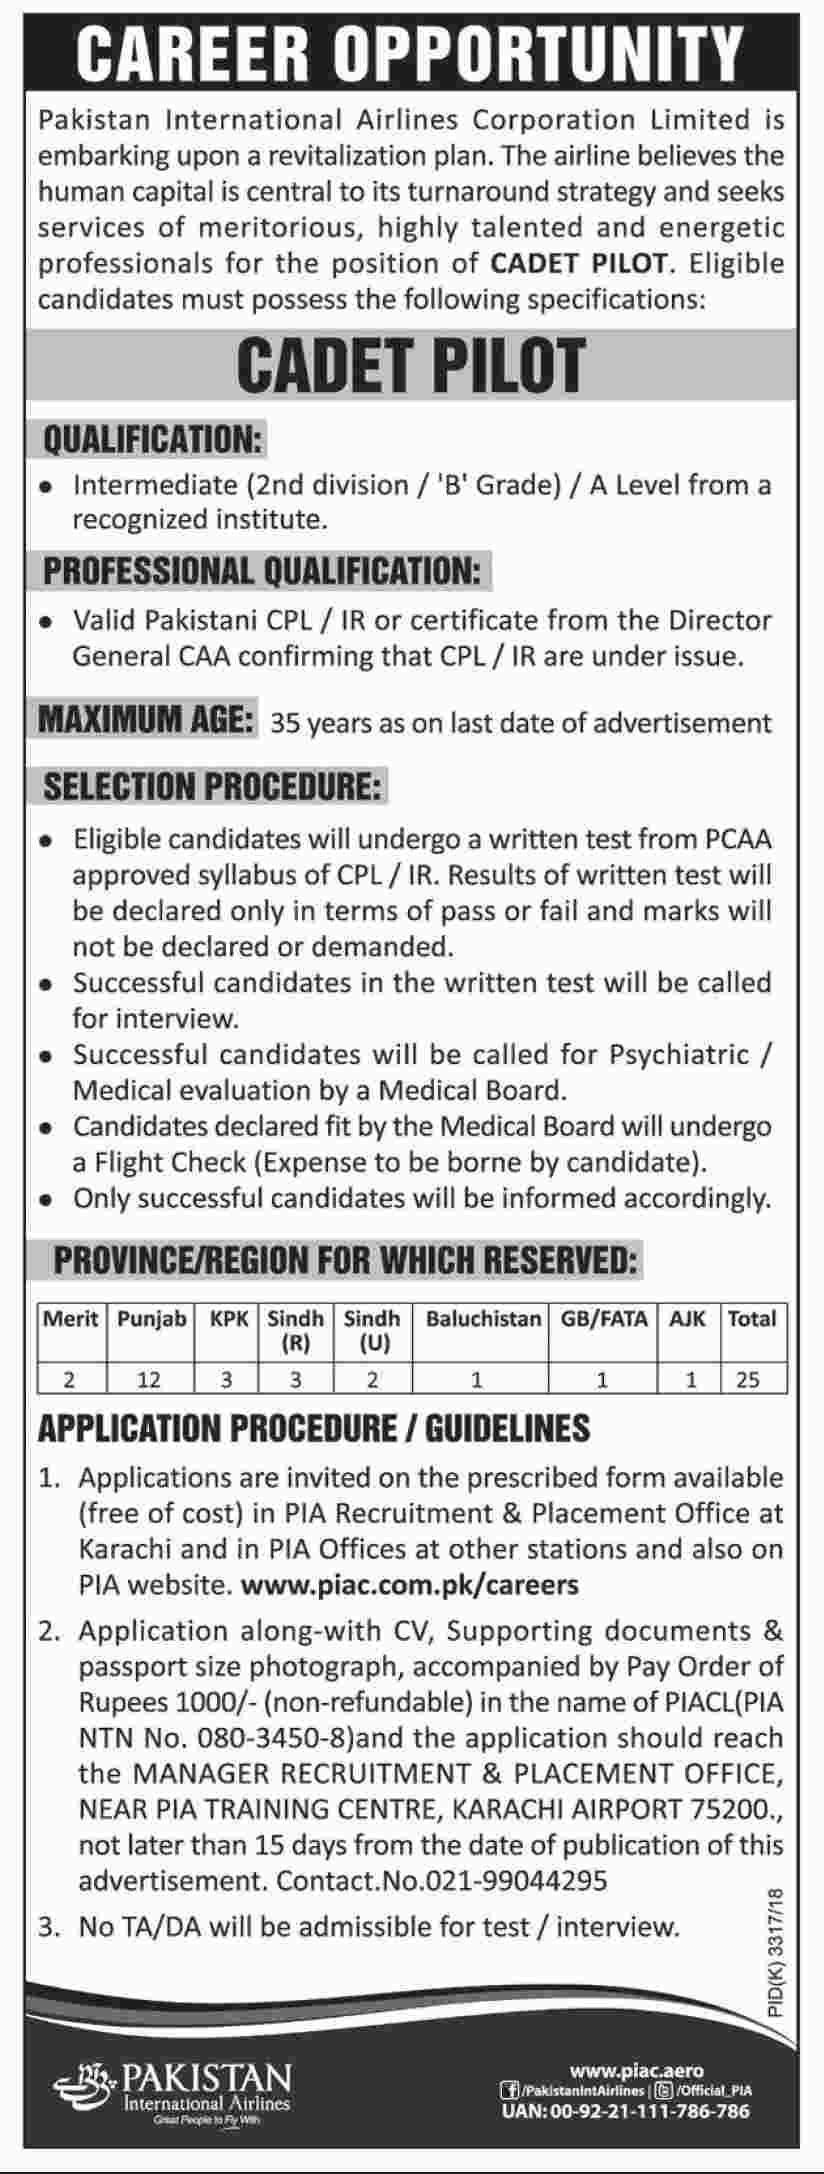 PIA Pakistan Jobs 2018 Cadet Pilot Jobs Application Form Deadline 18-03-2018 Apply Online Now